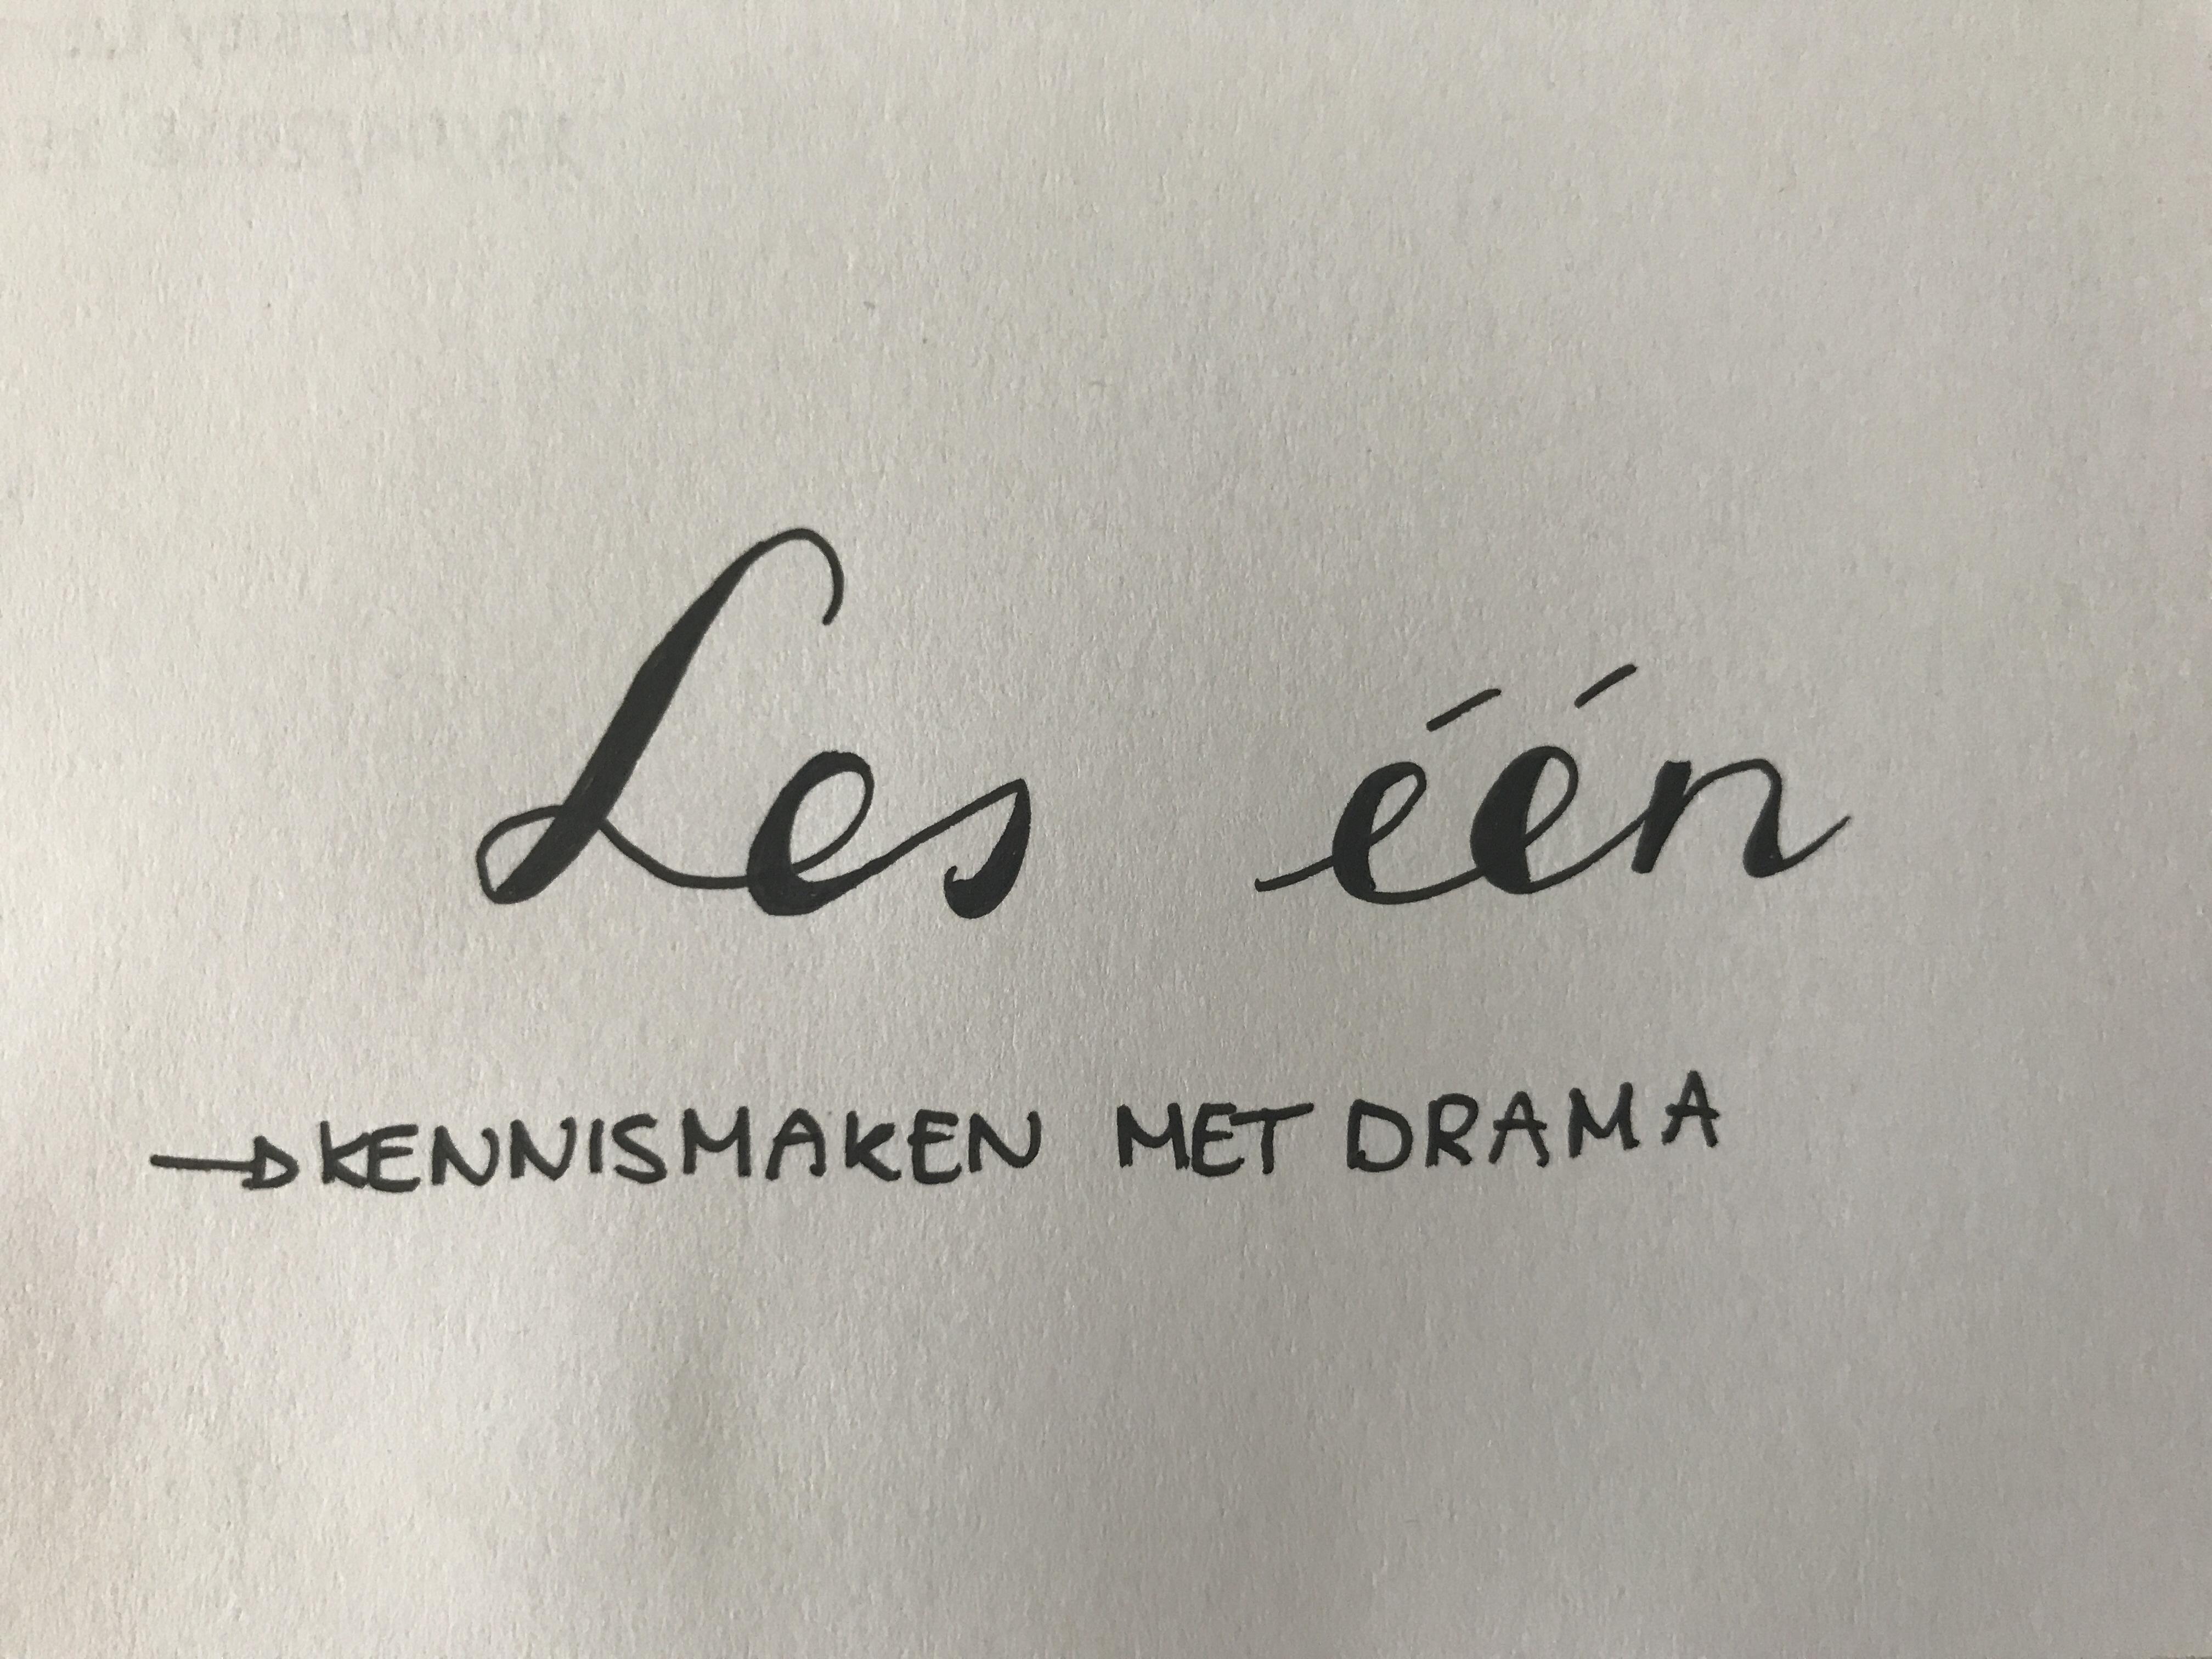 Les één: kennismaken met drama